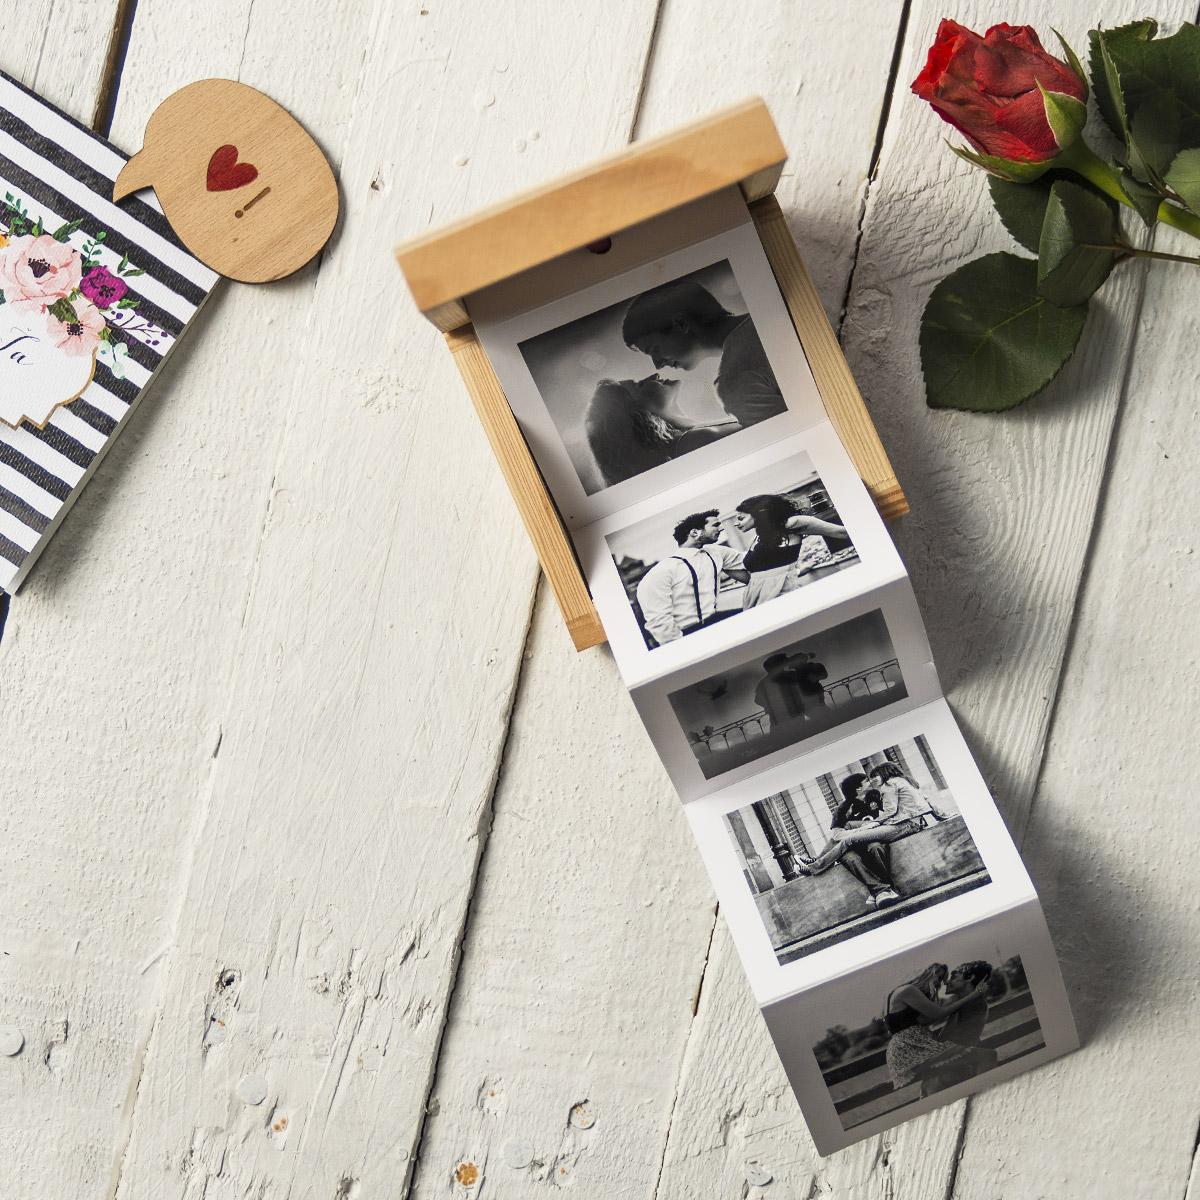 Drevená krabička s vašimi fotografiami